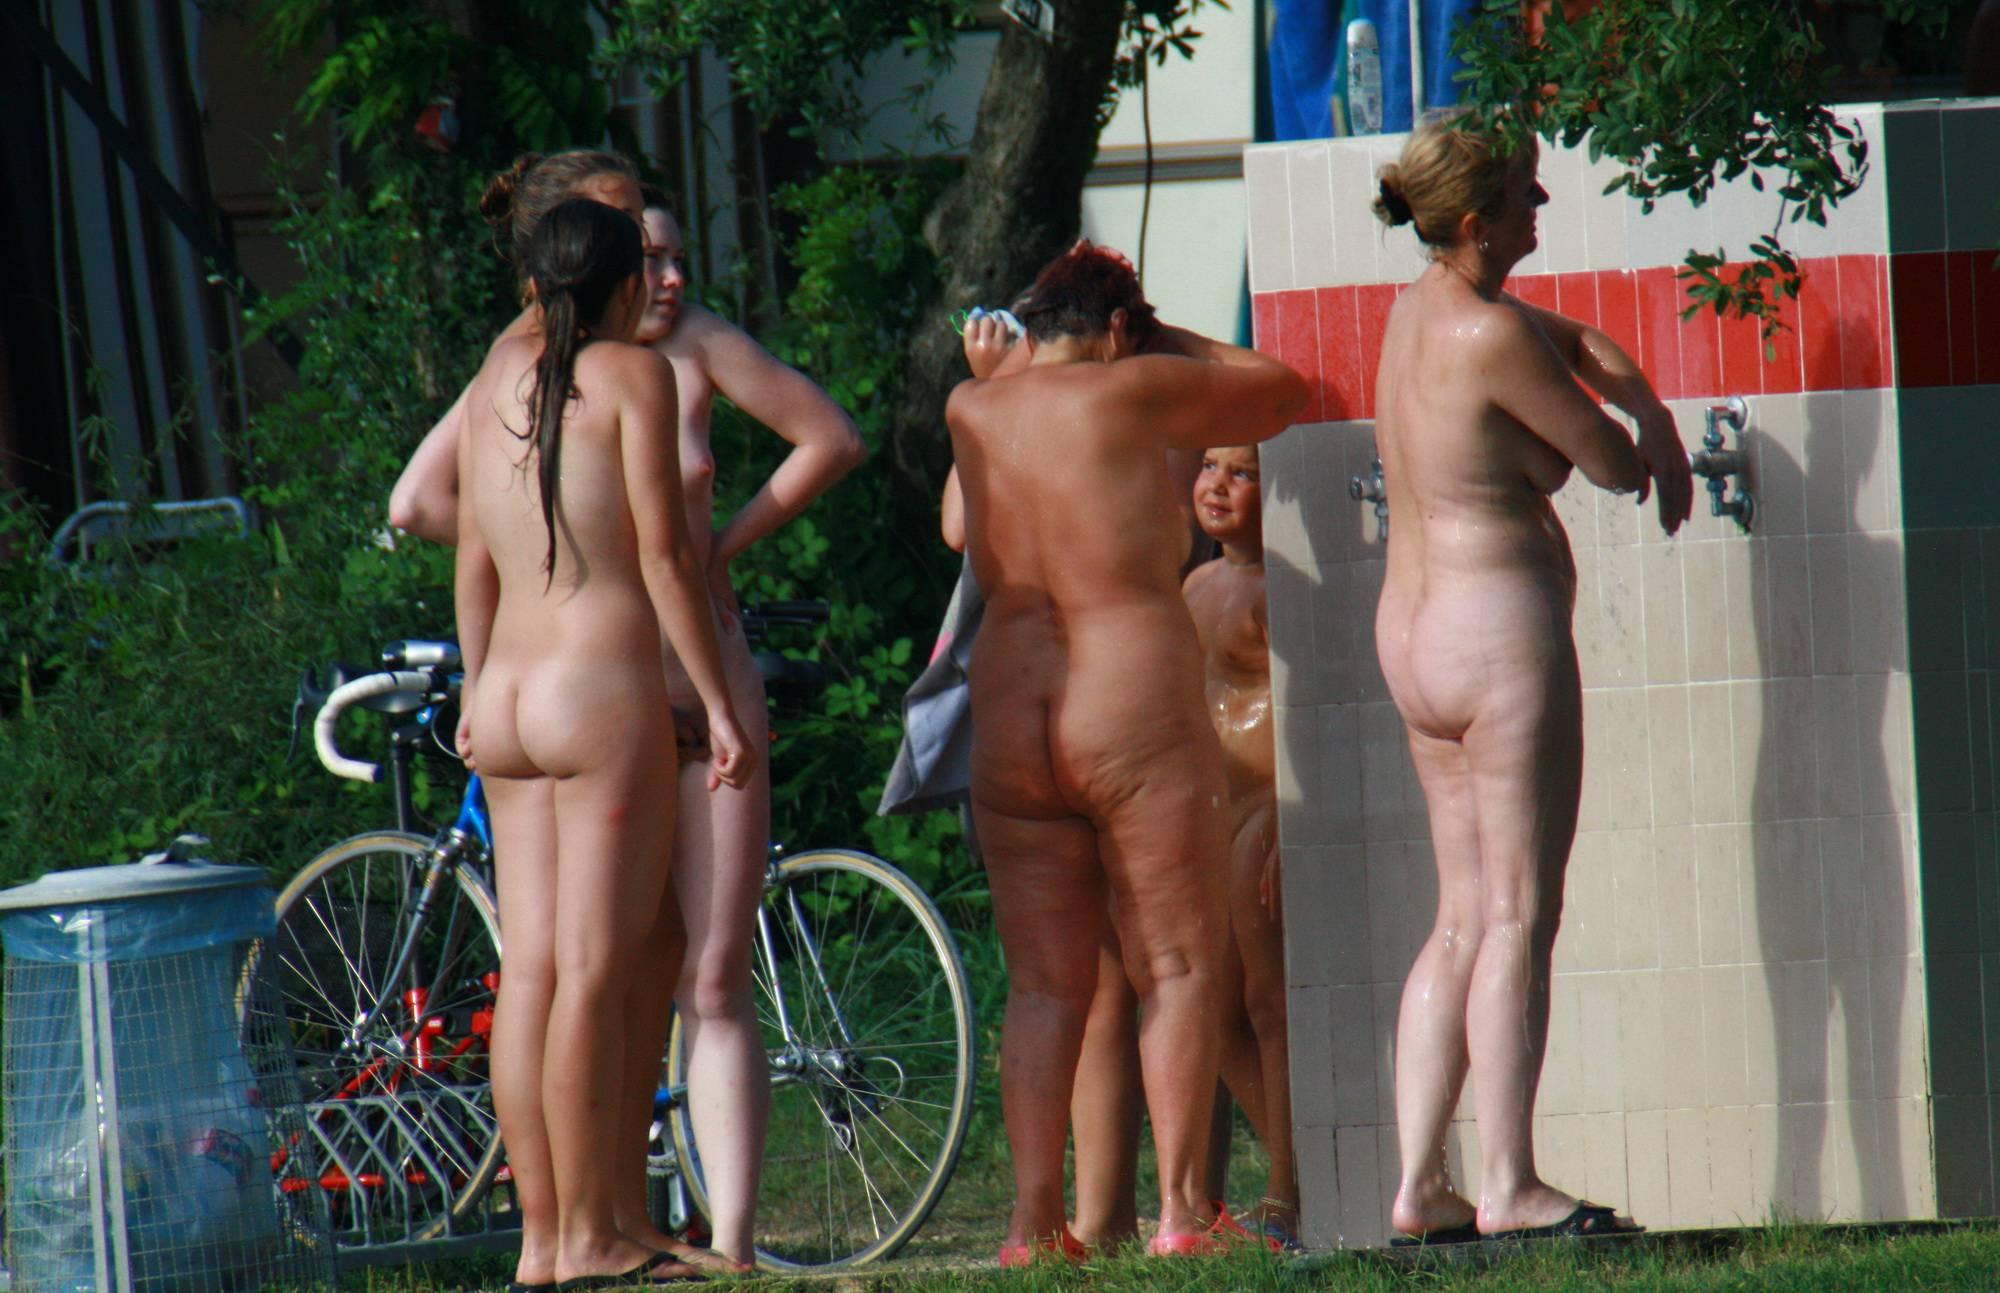 Nude Duet Group Shower - 2